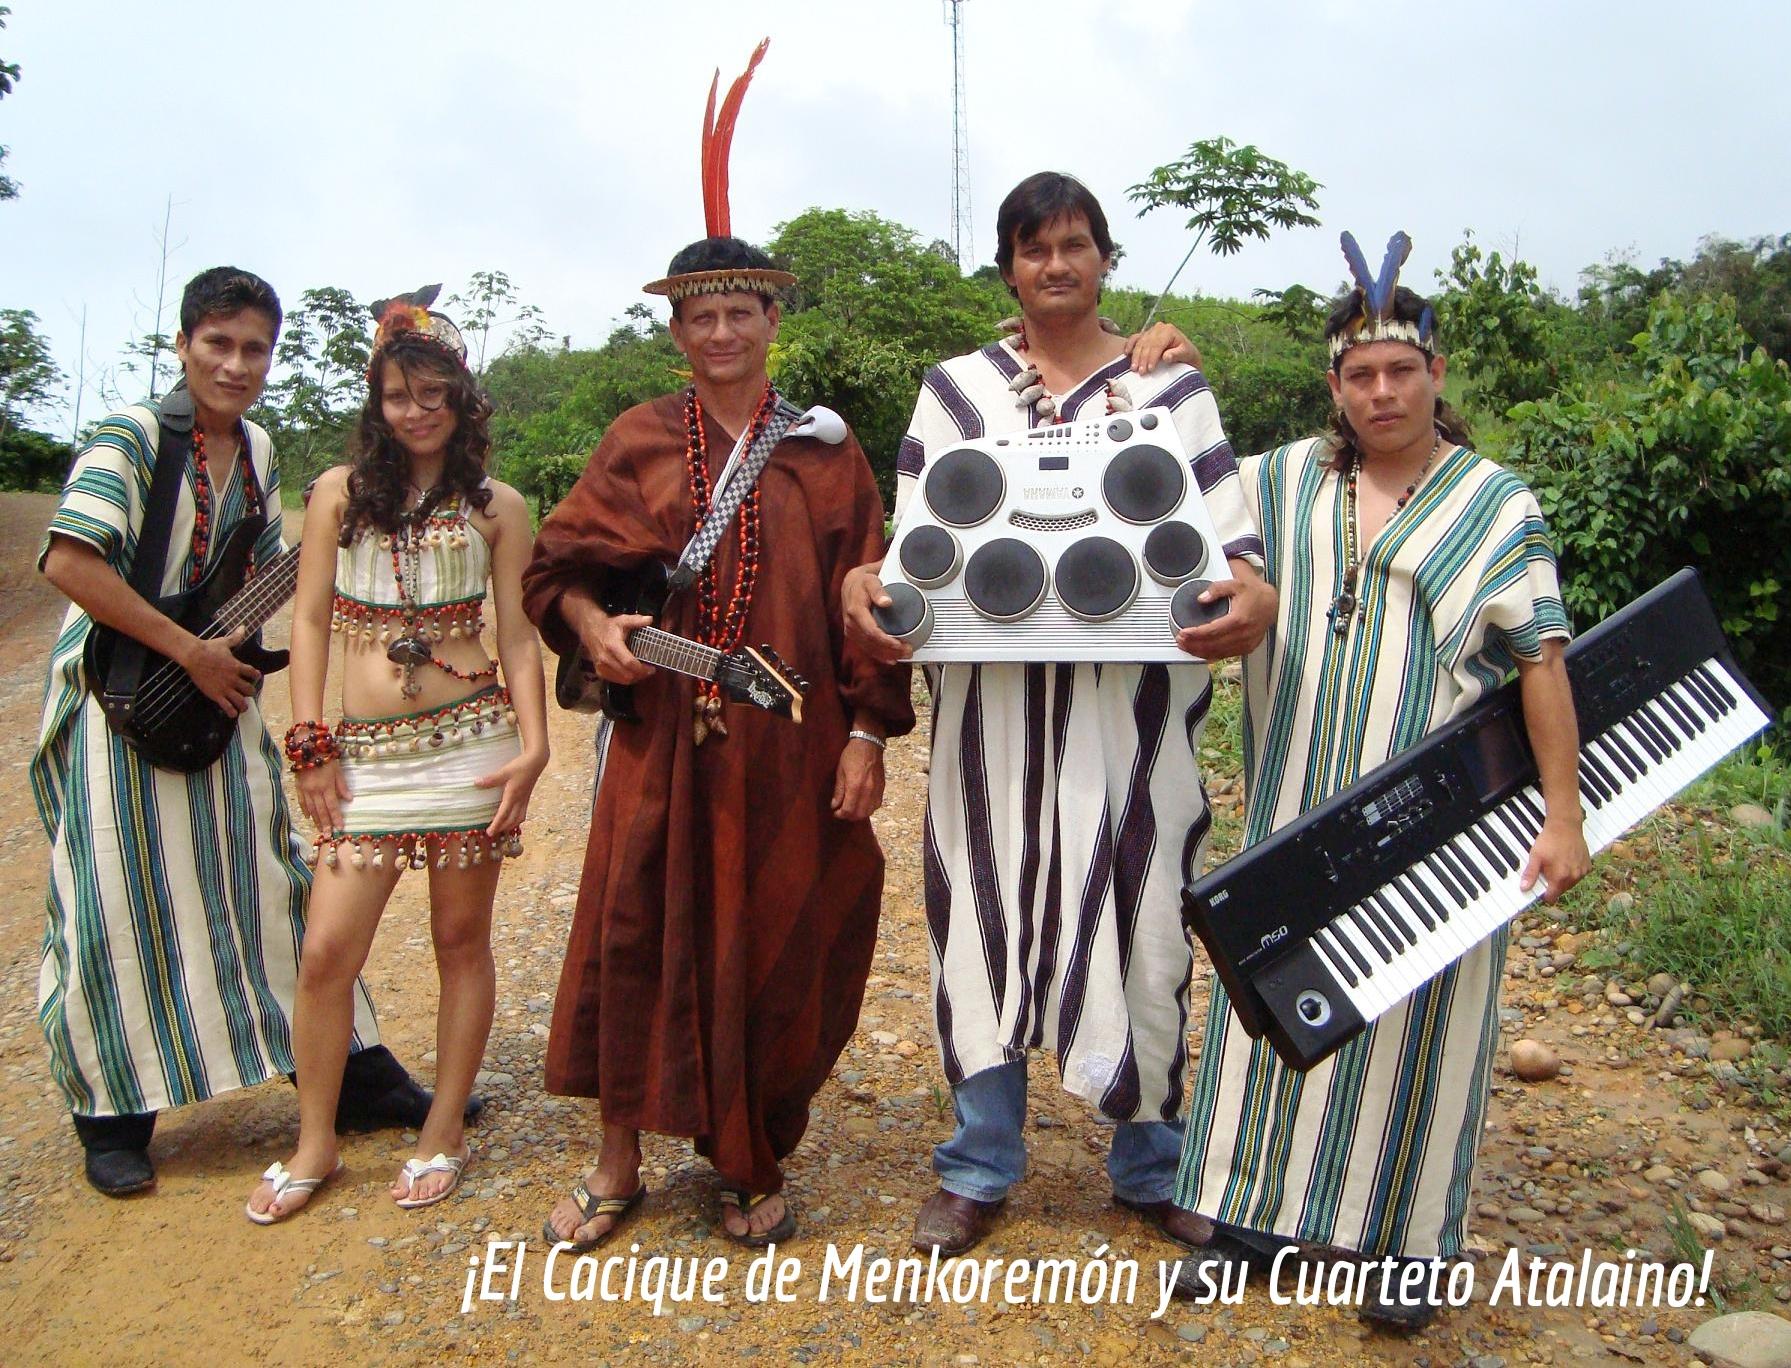 Menko and Band.JPG